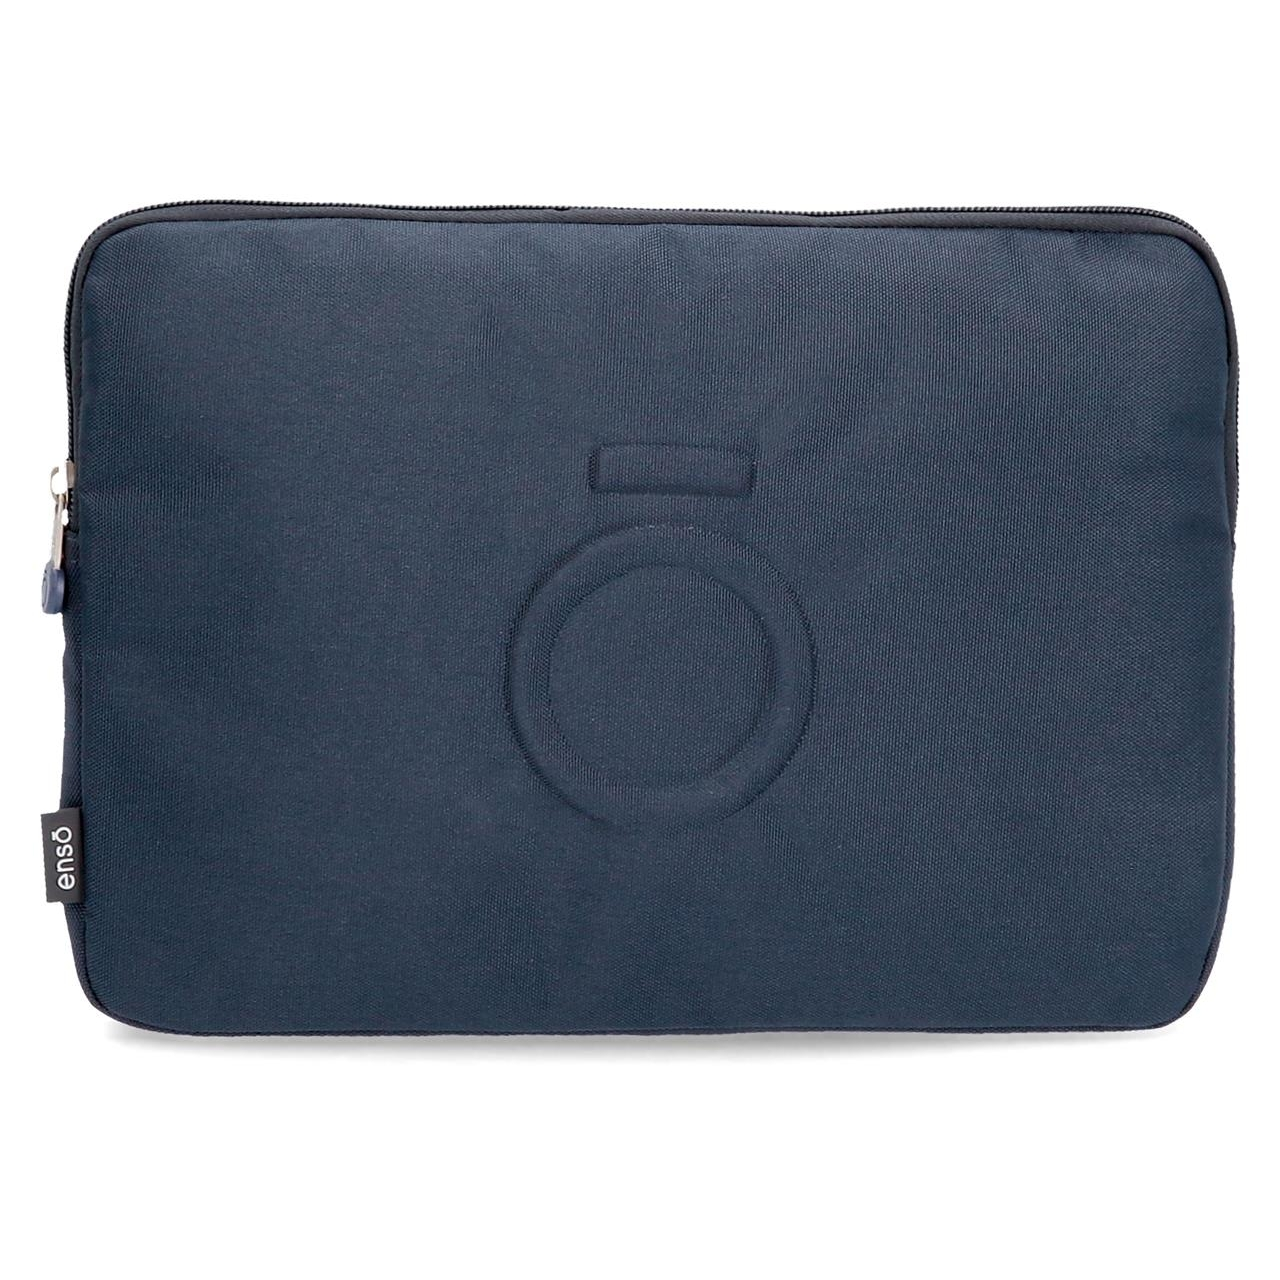 Funda para Tablet Enso Basic Azul